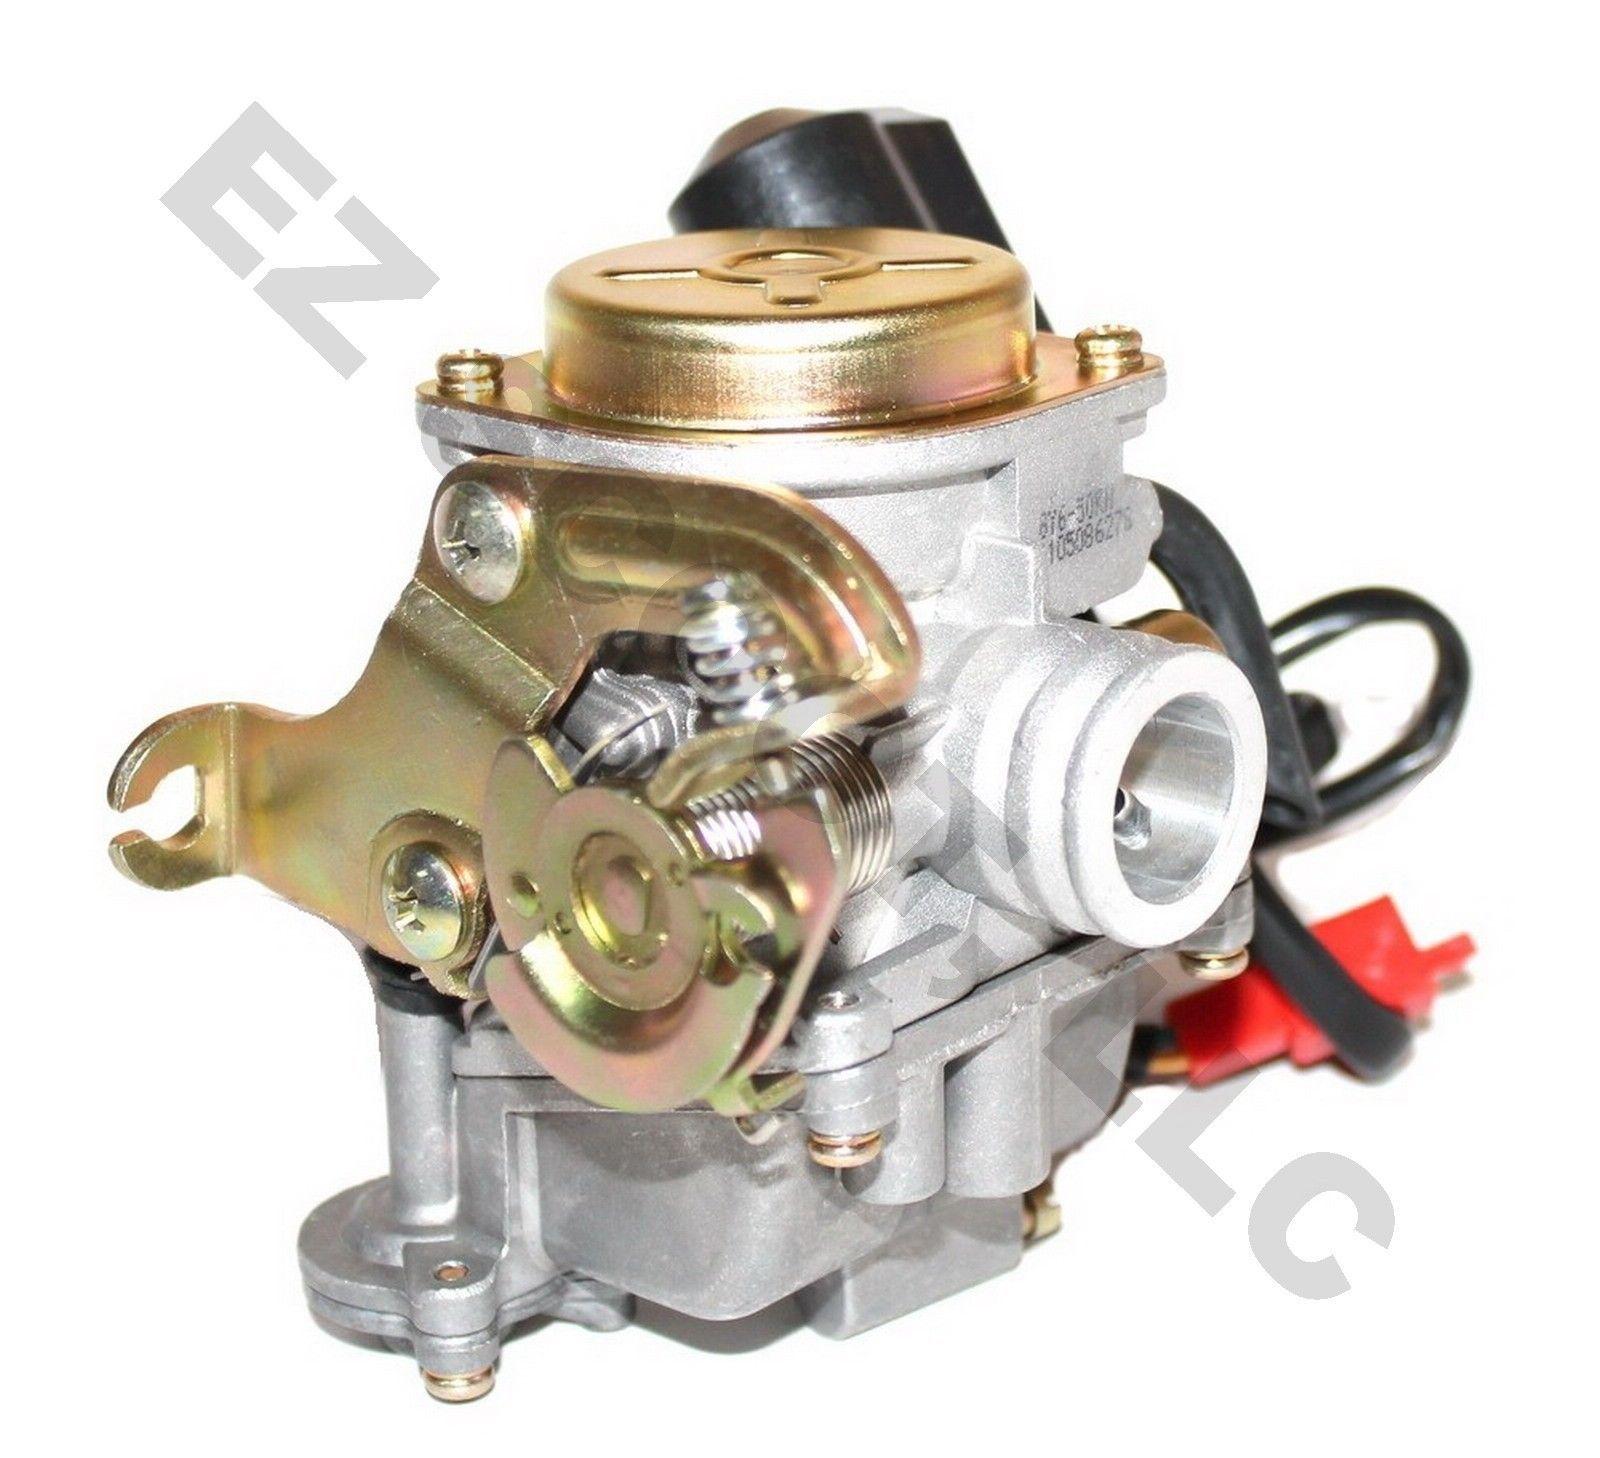 carburetor sport for 139 qmb 50 80cc 19mm gy6 chinese 4stroke scooter atv taotao ebay [ 1600 x 1458 Pixel ]